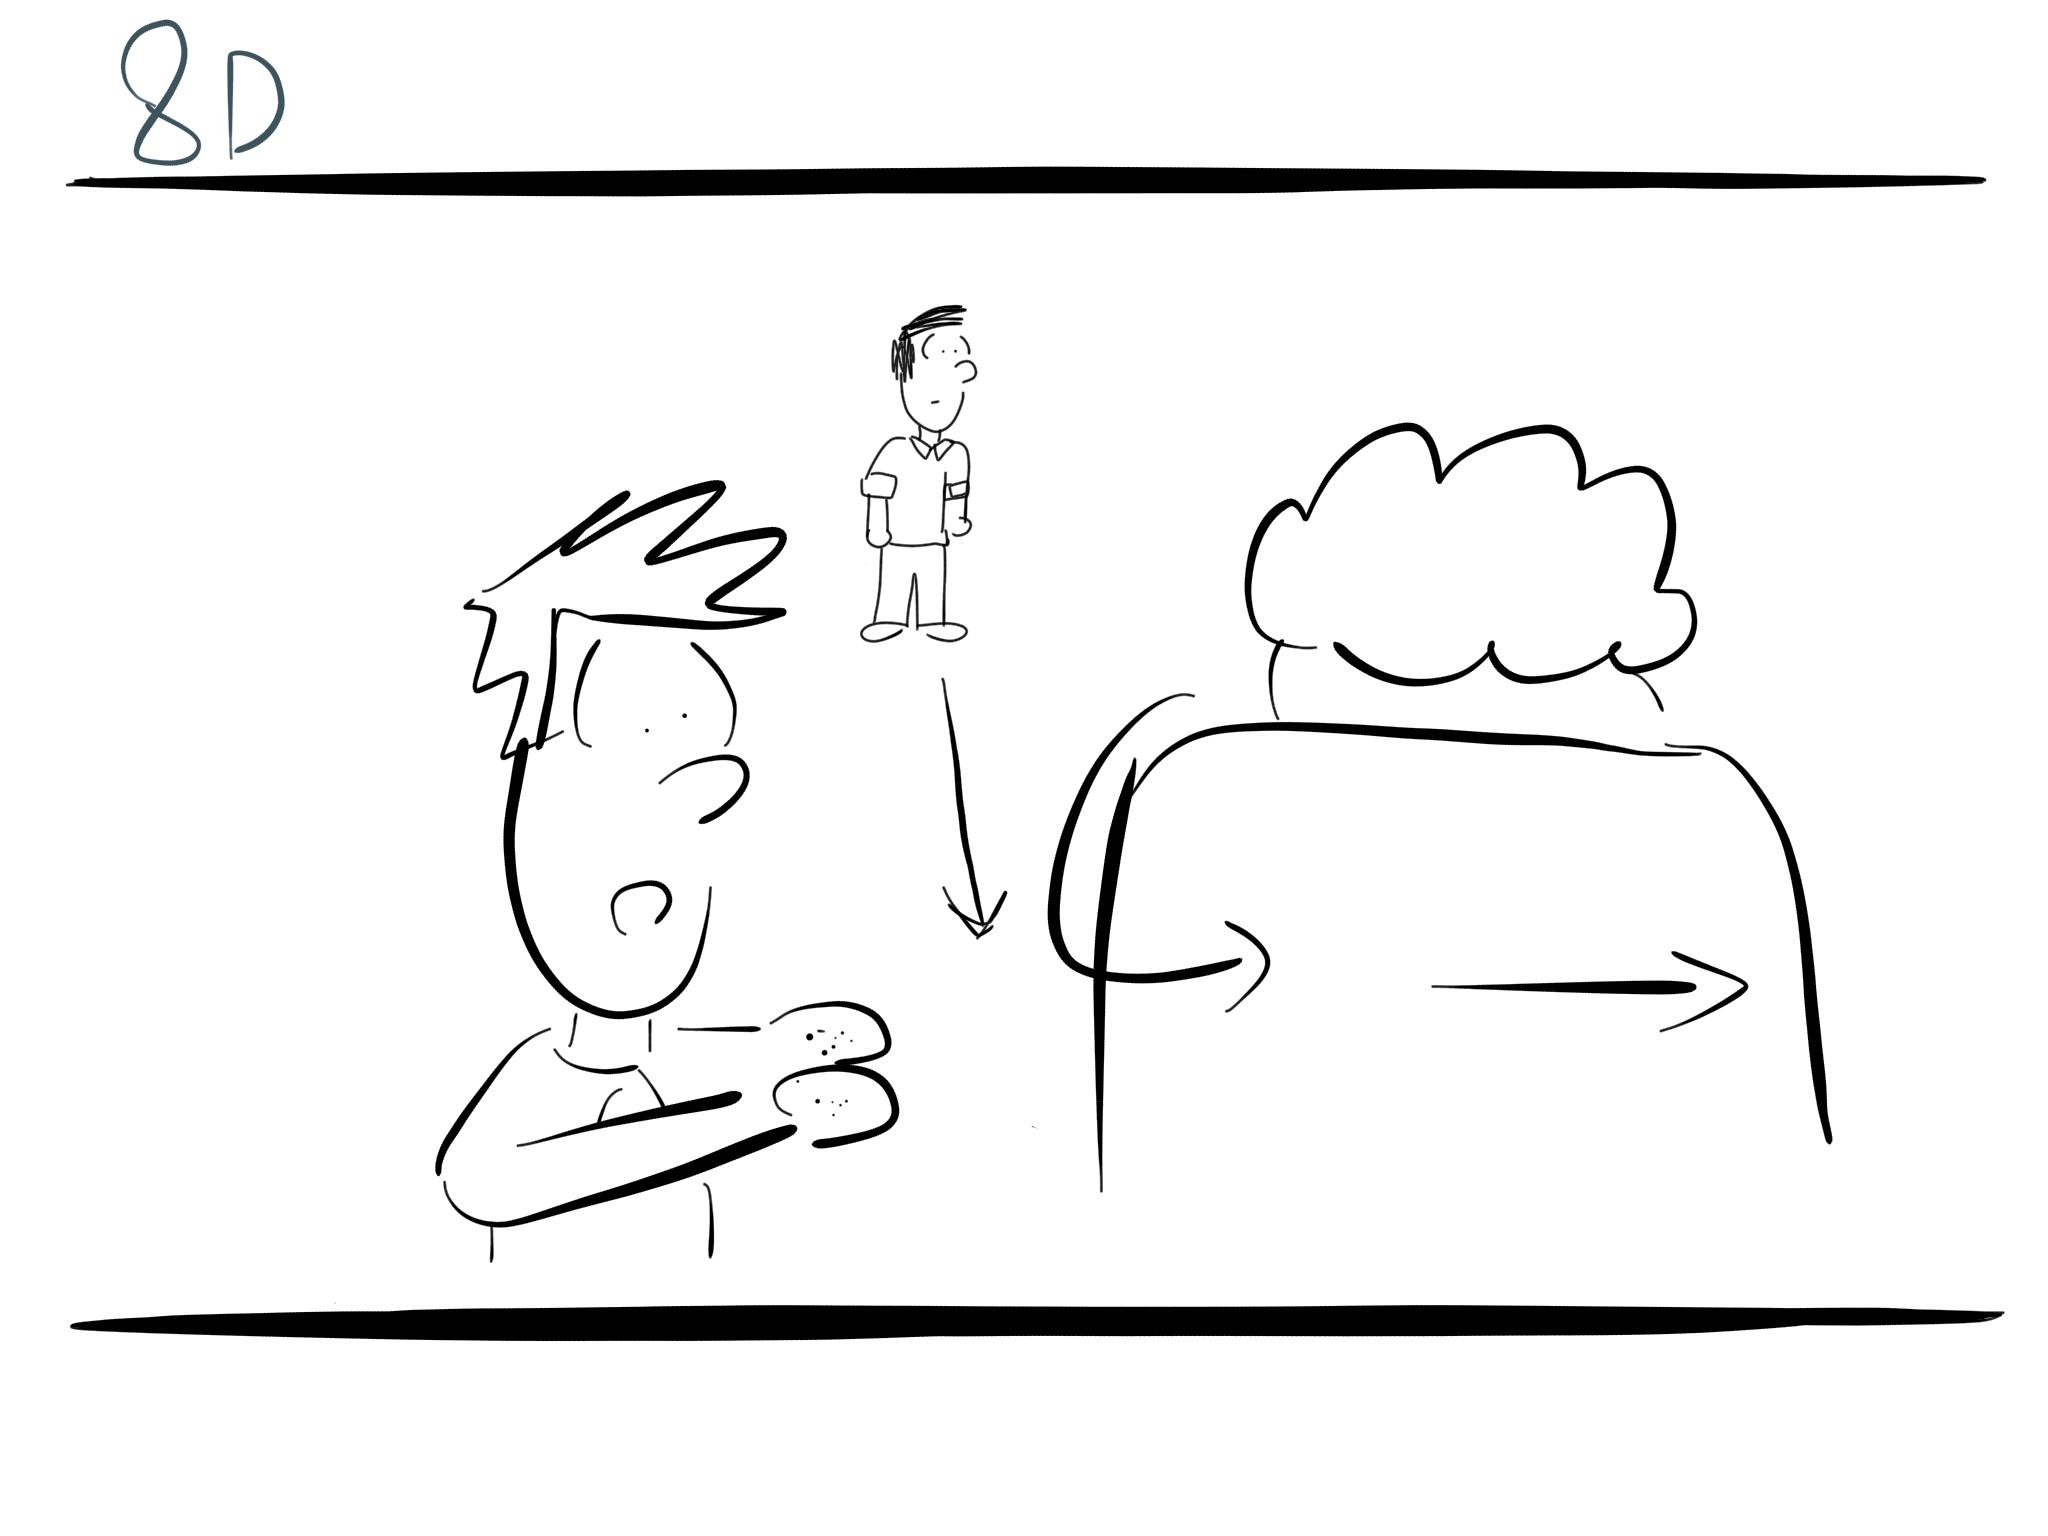 BDF_Storyboards_38.jpg